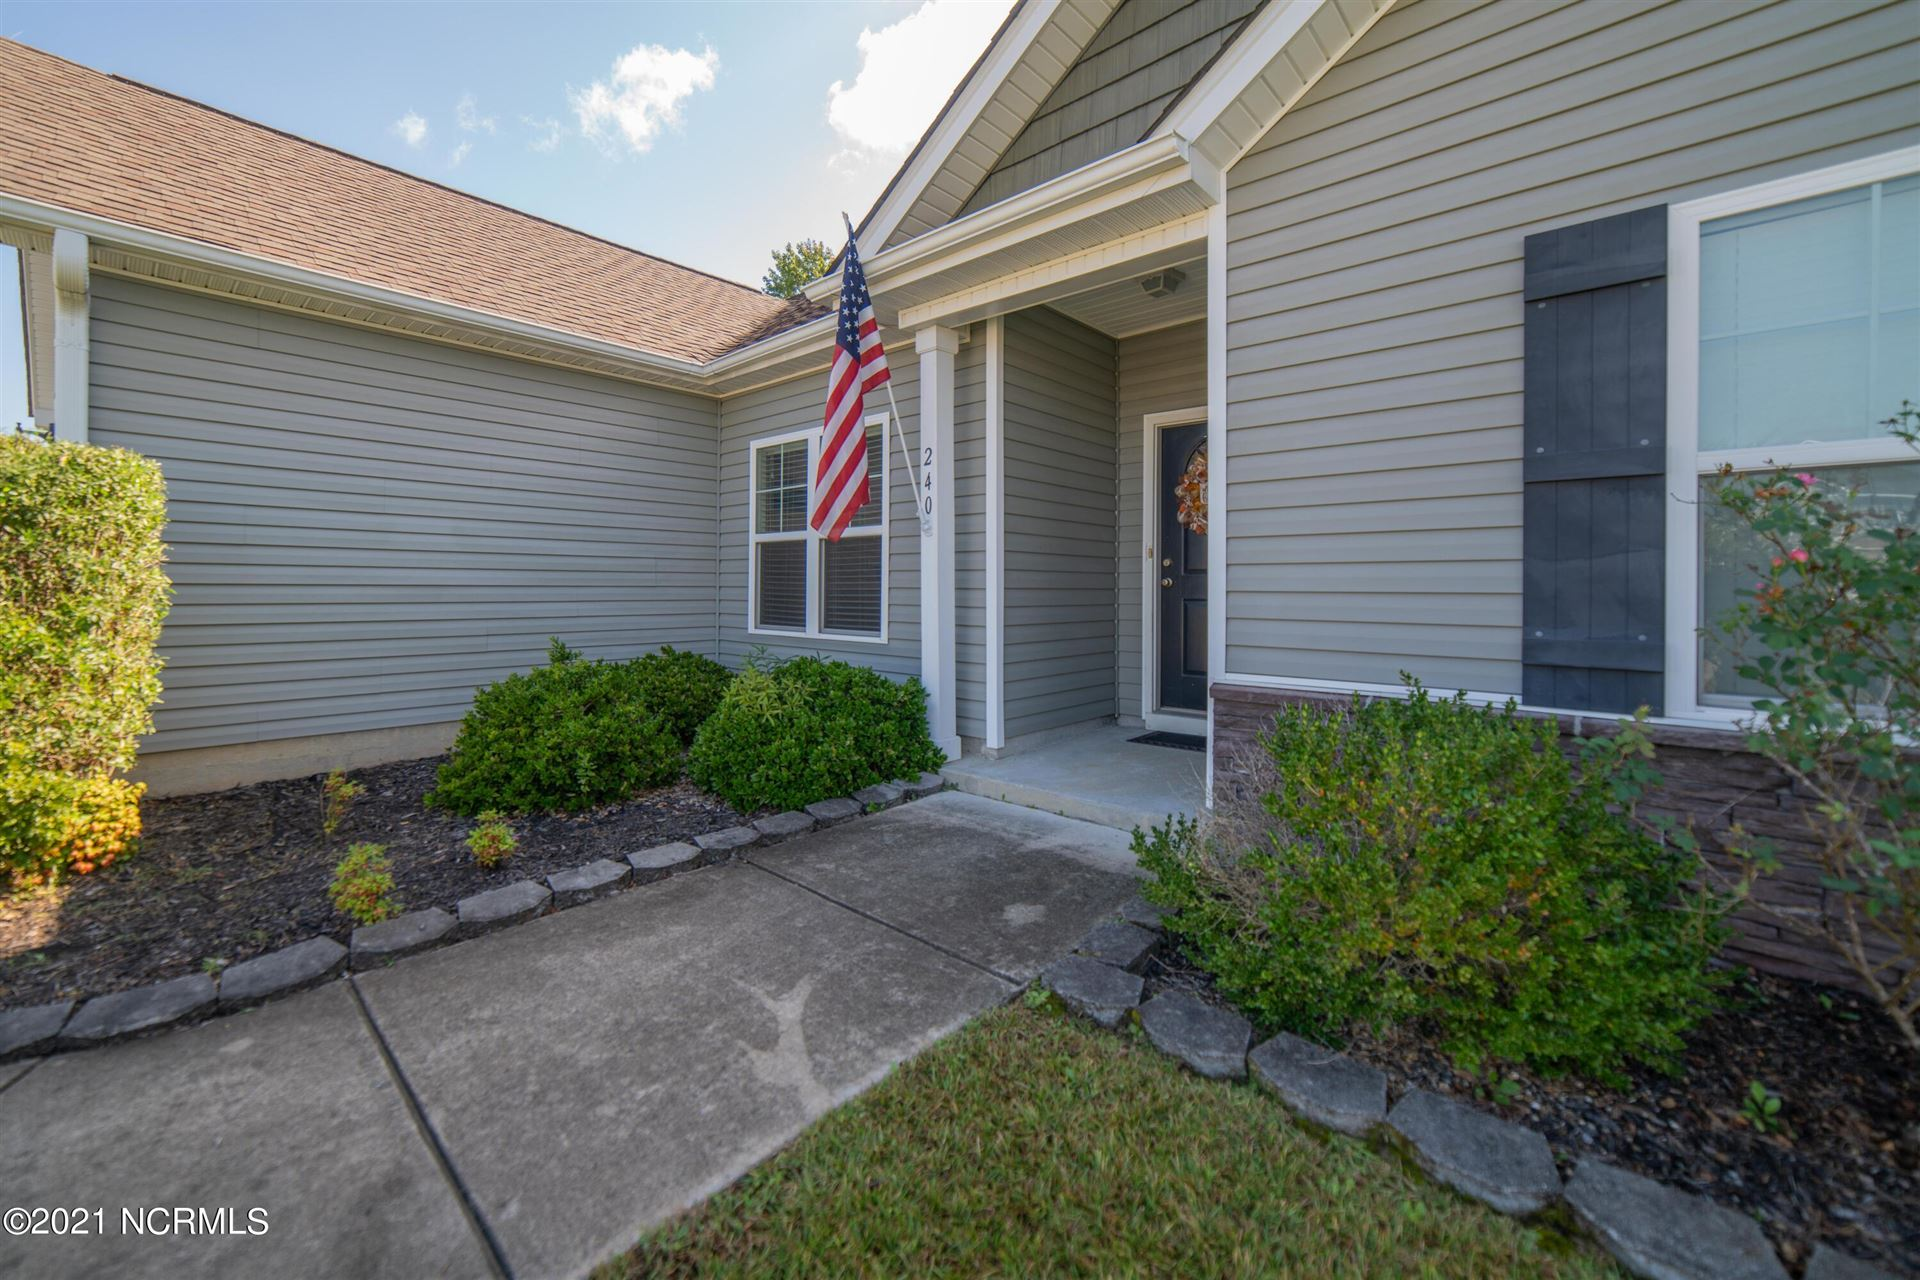 Photo of 240 Seville Street, Jacksonville, NC 28546 (MLS # 100293148)